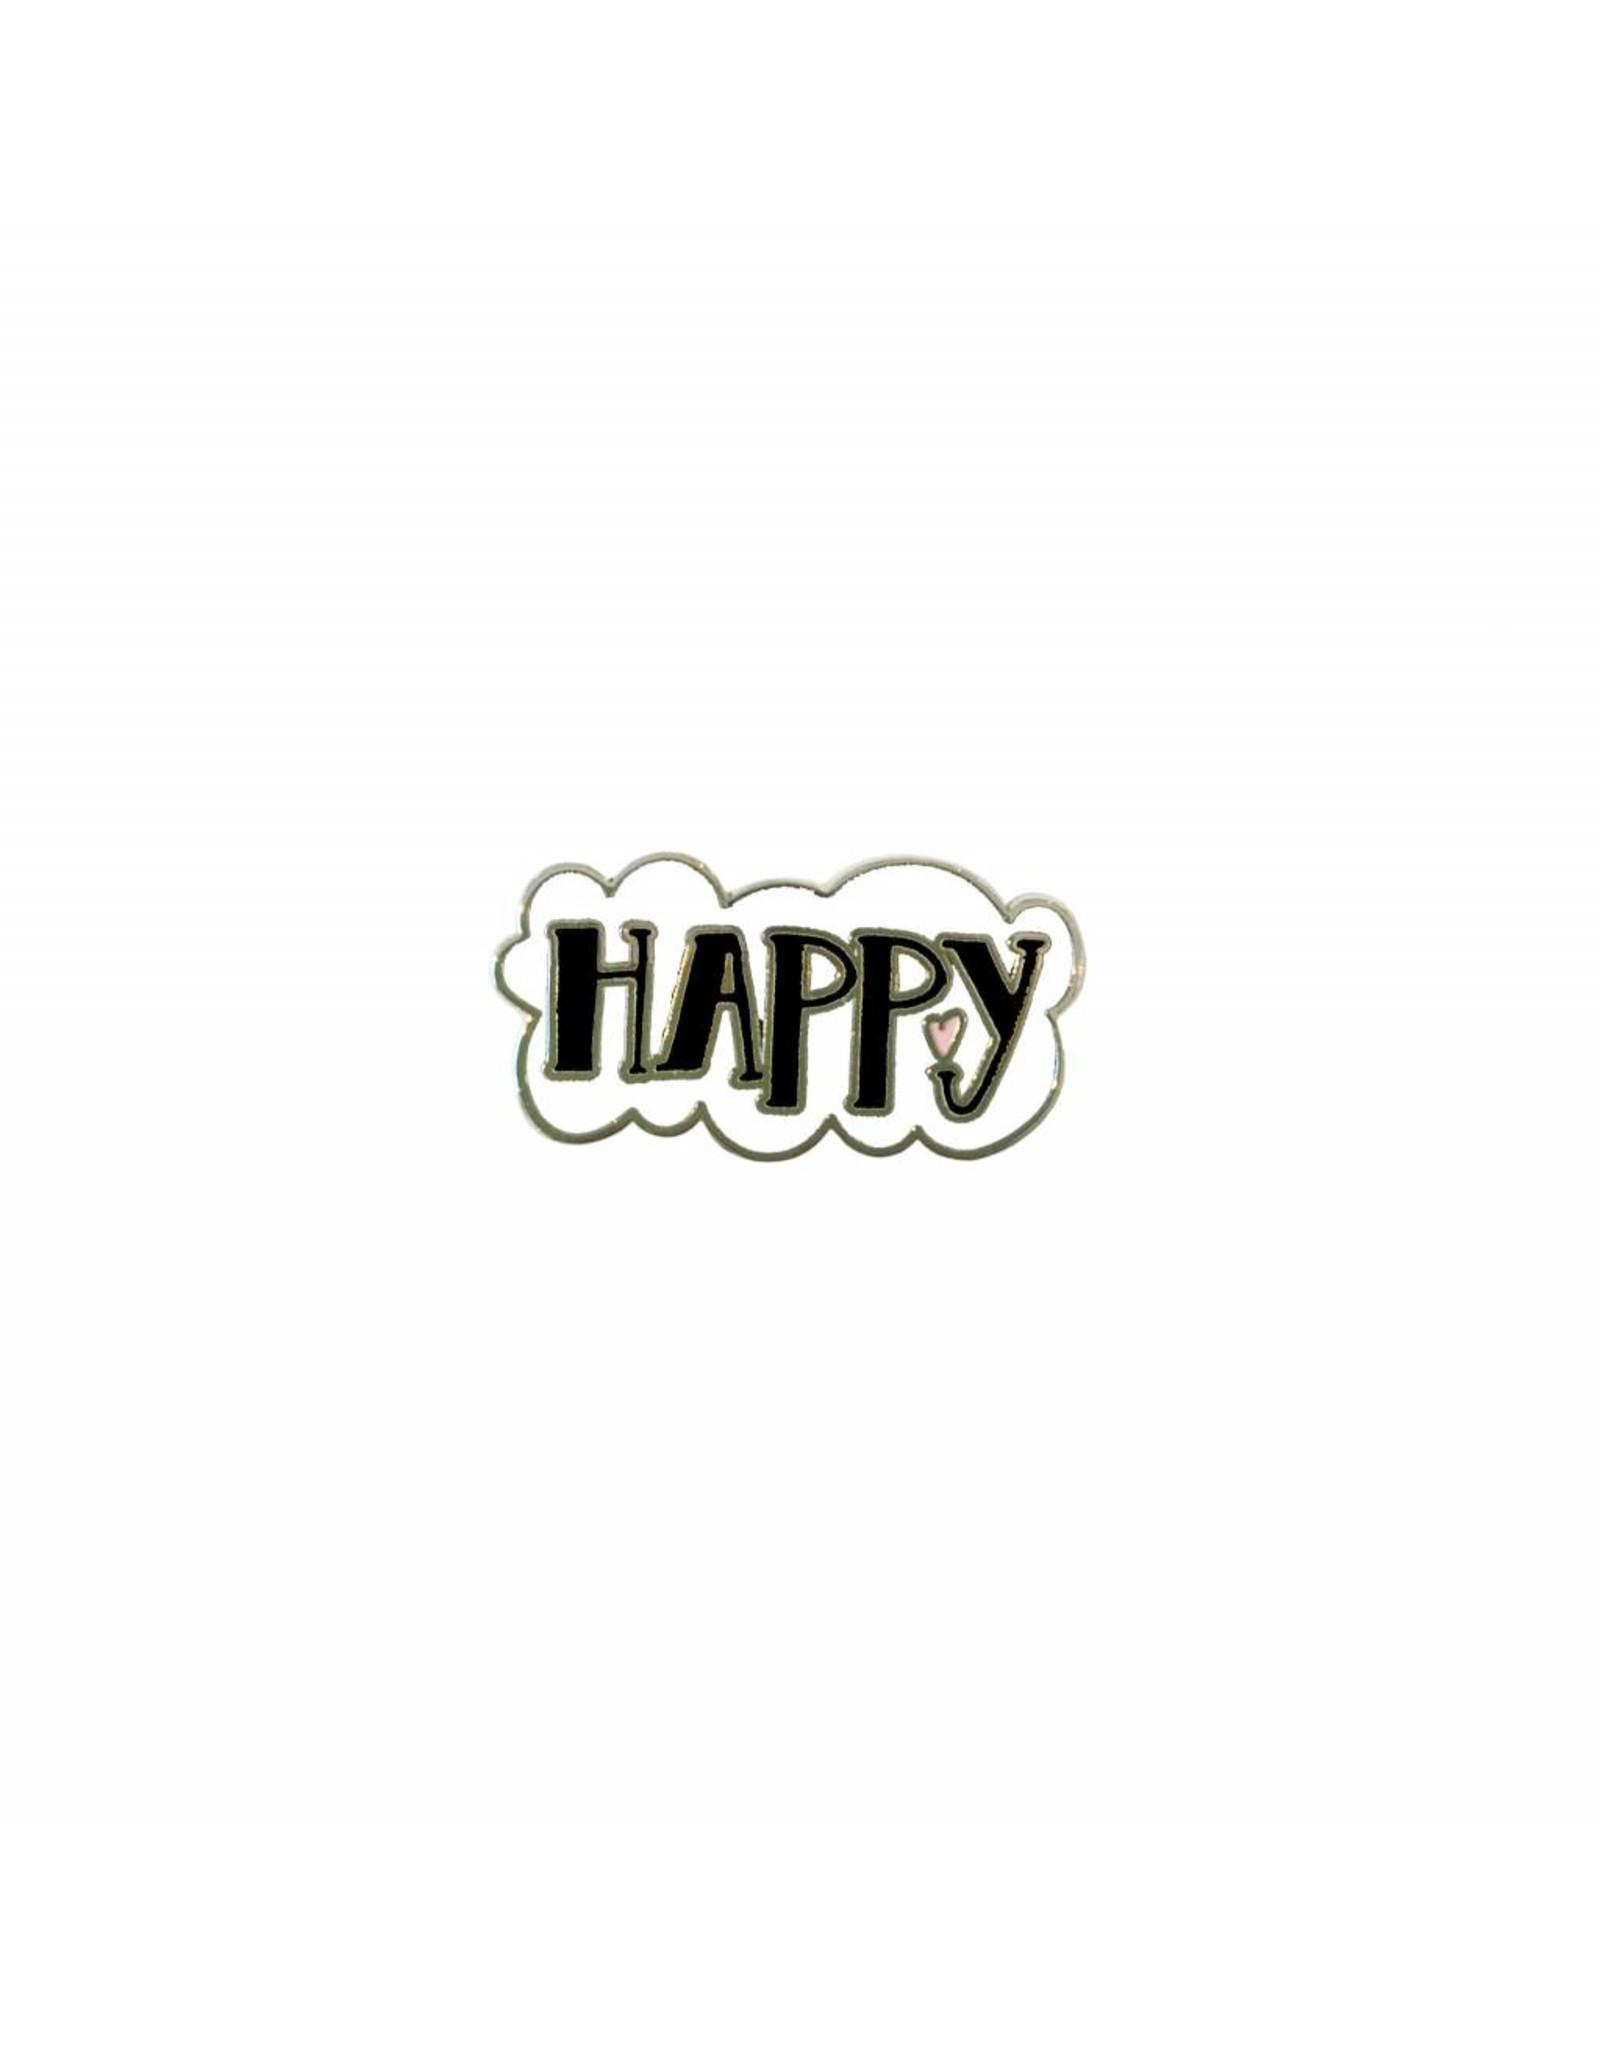 Pin happy wit